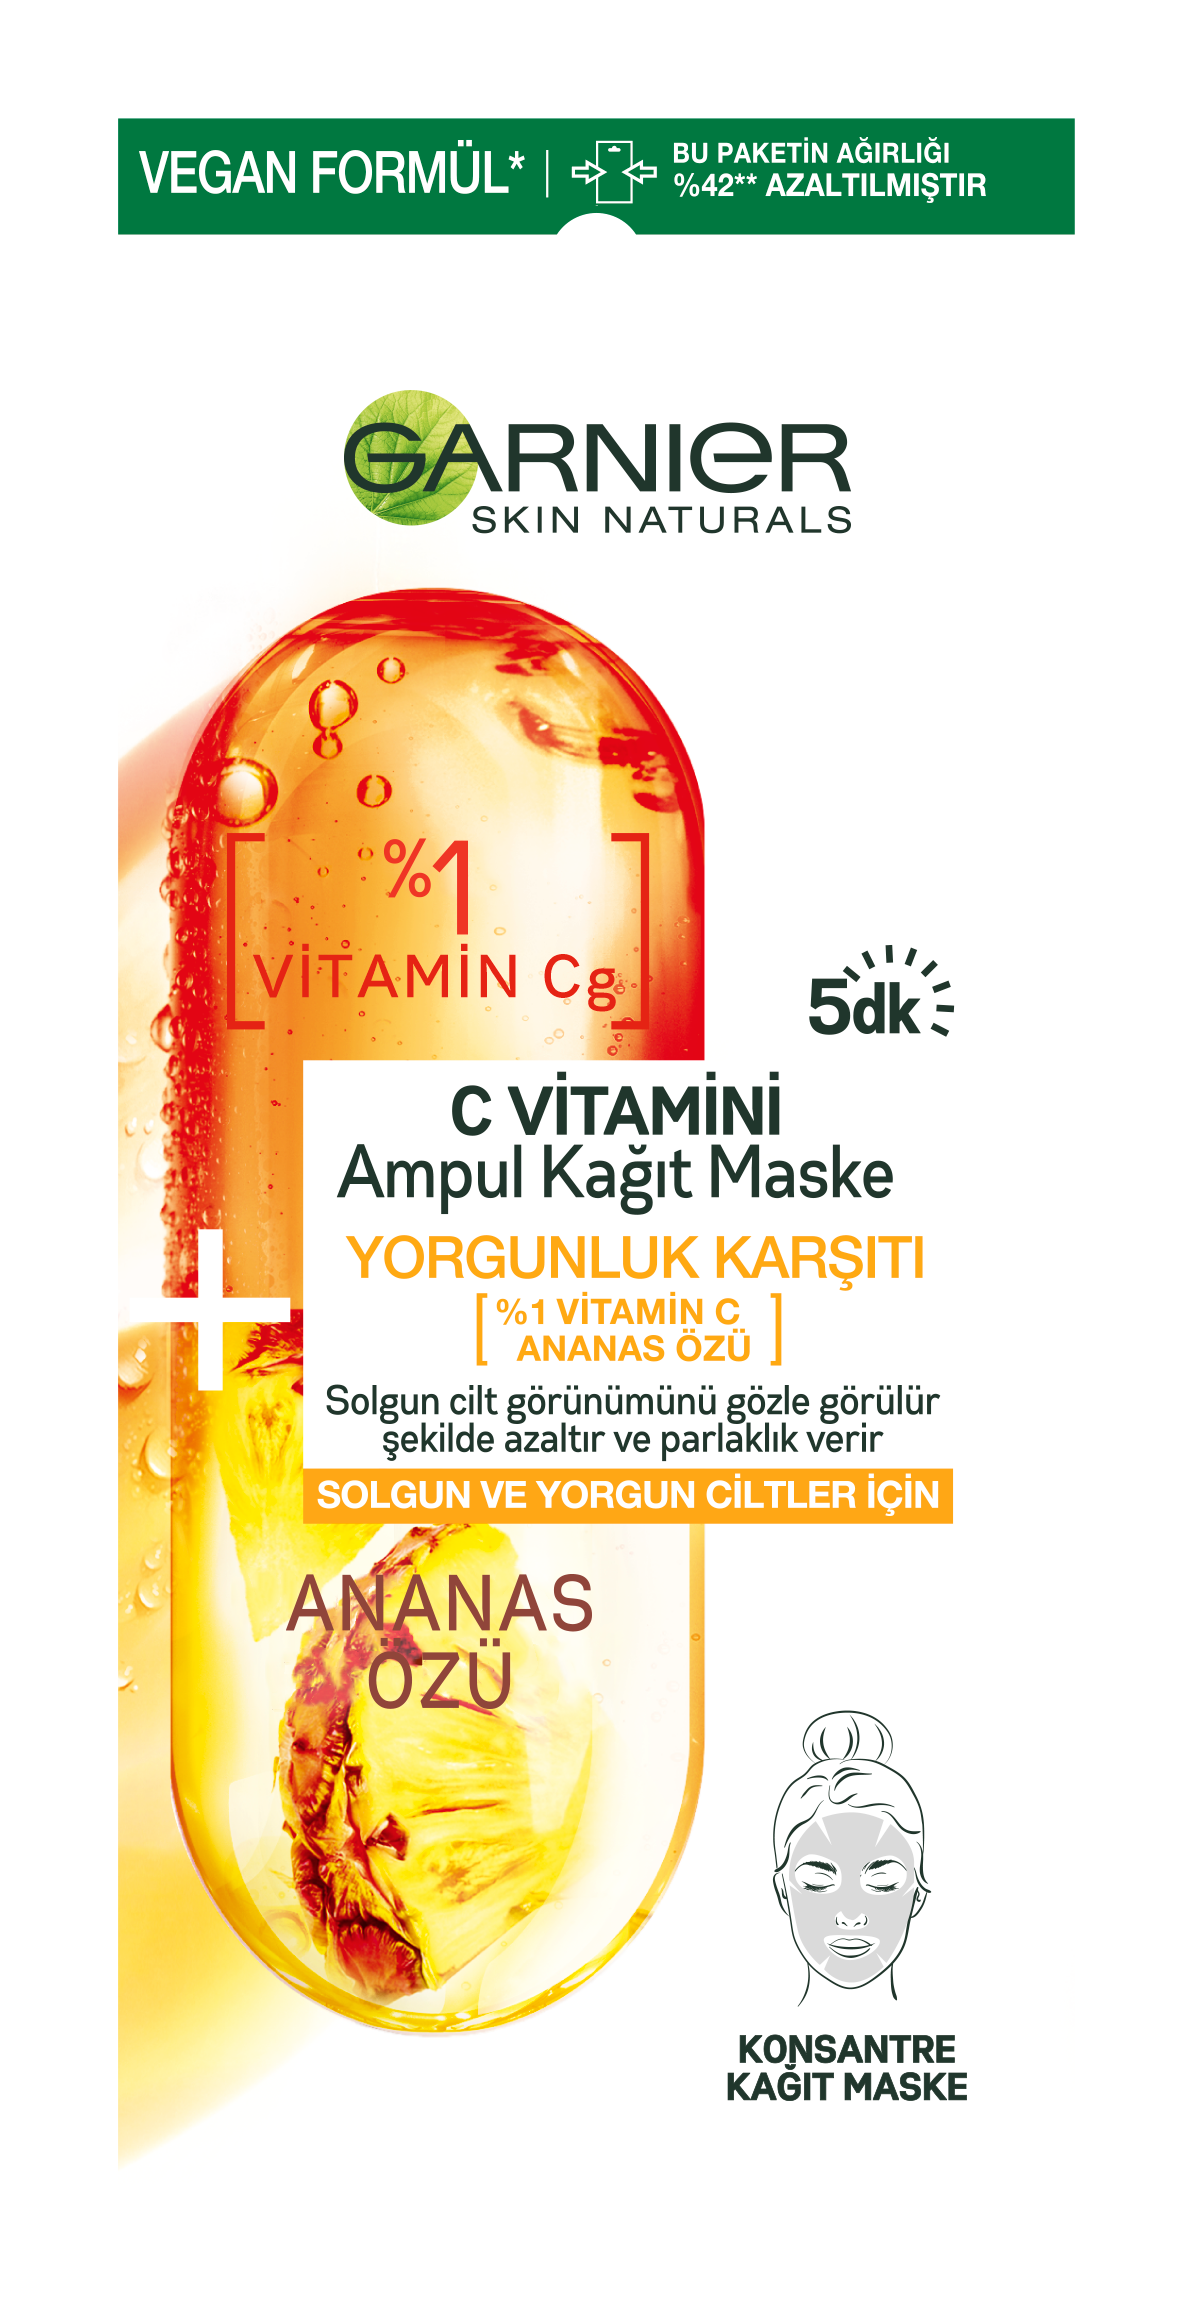 C Vitamini Yorgunluk Karşıtı Ampul Kağıt Yüz Maskesi